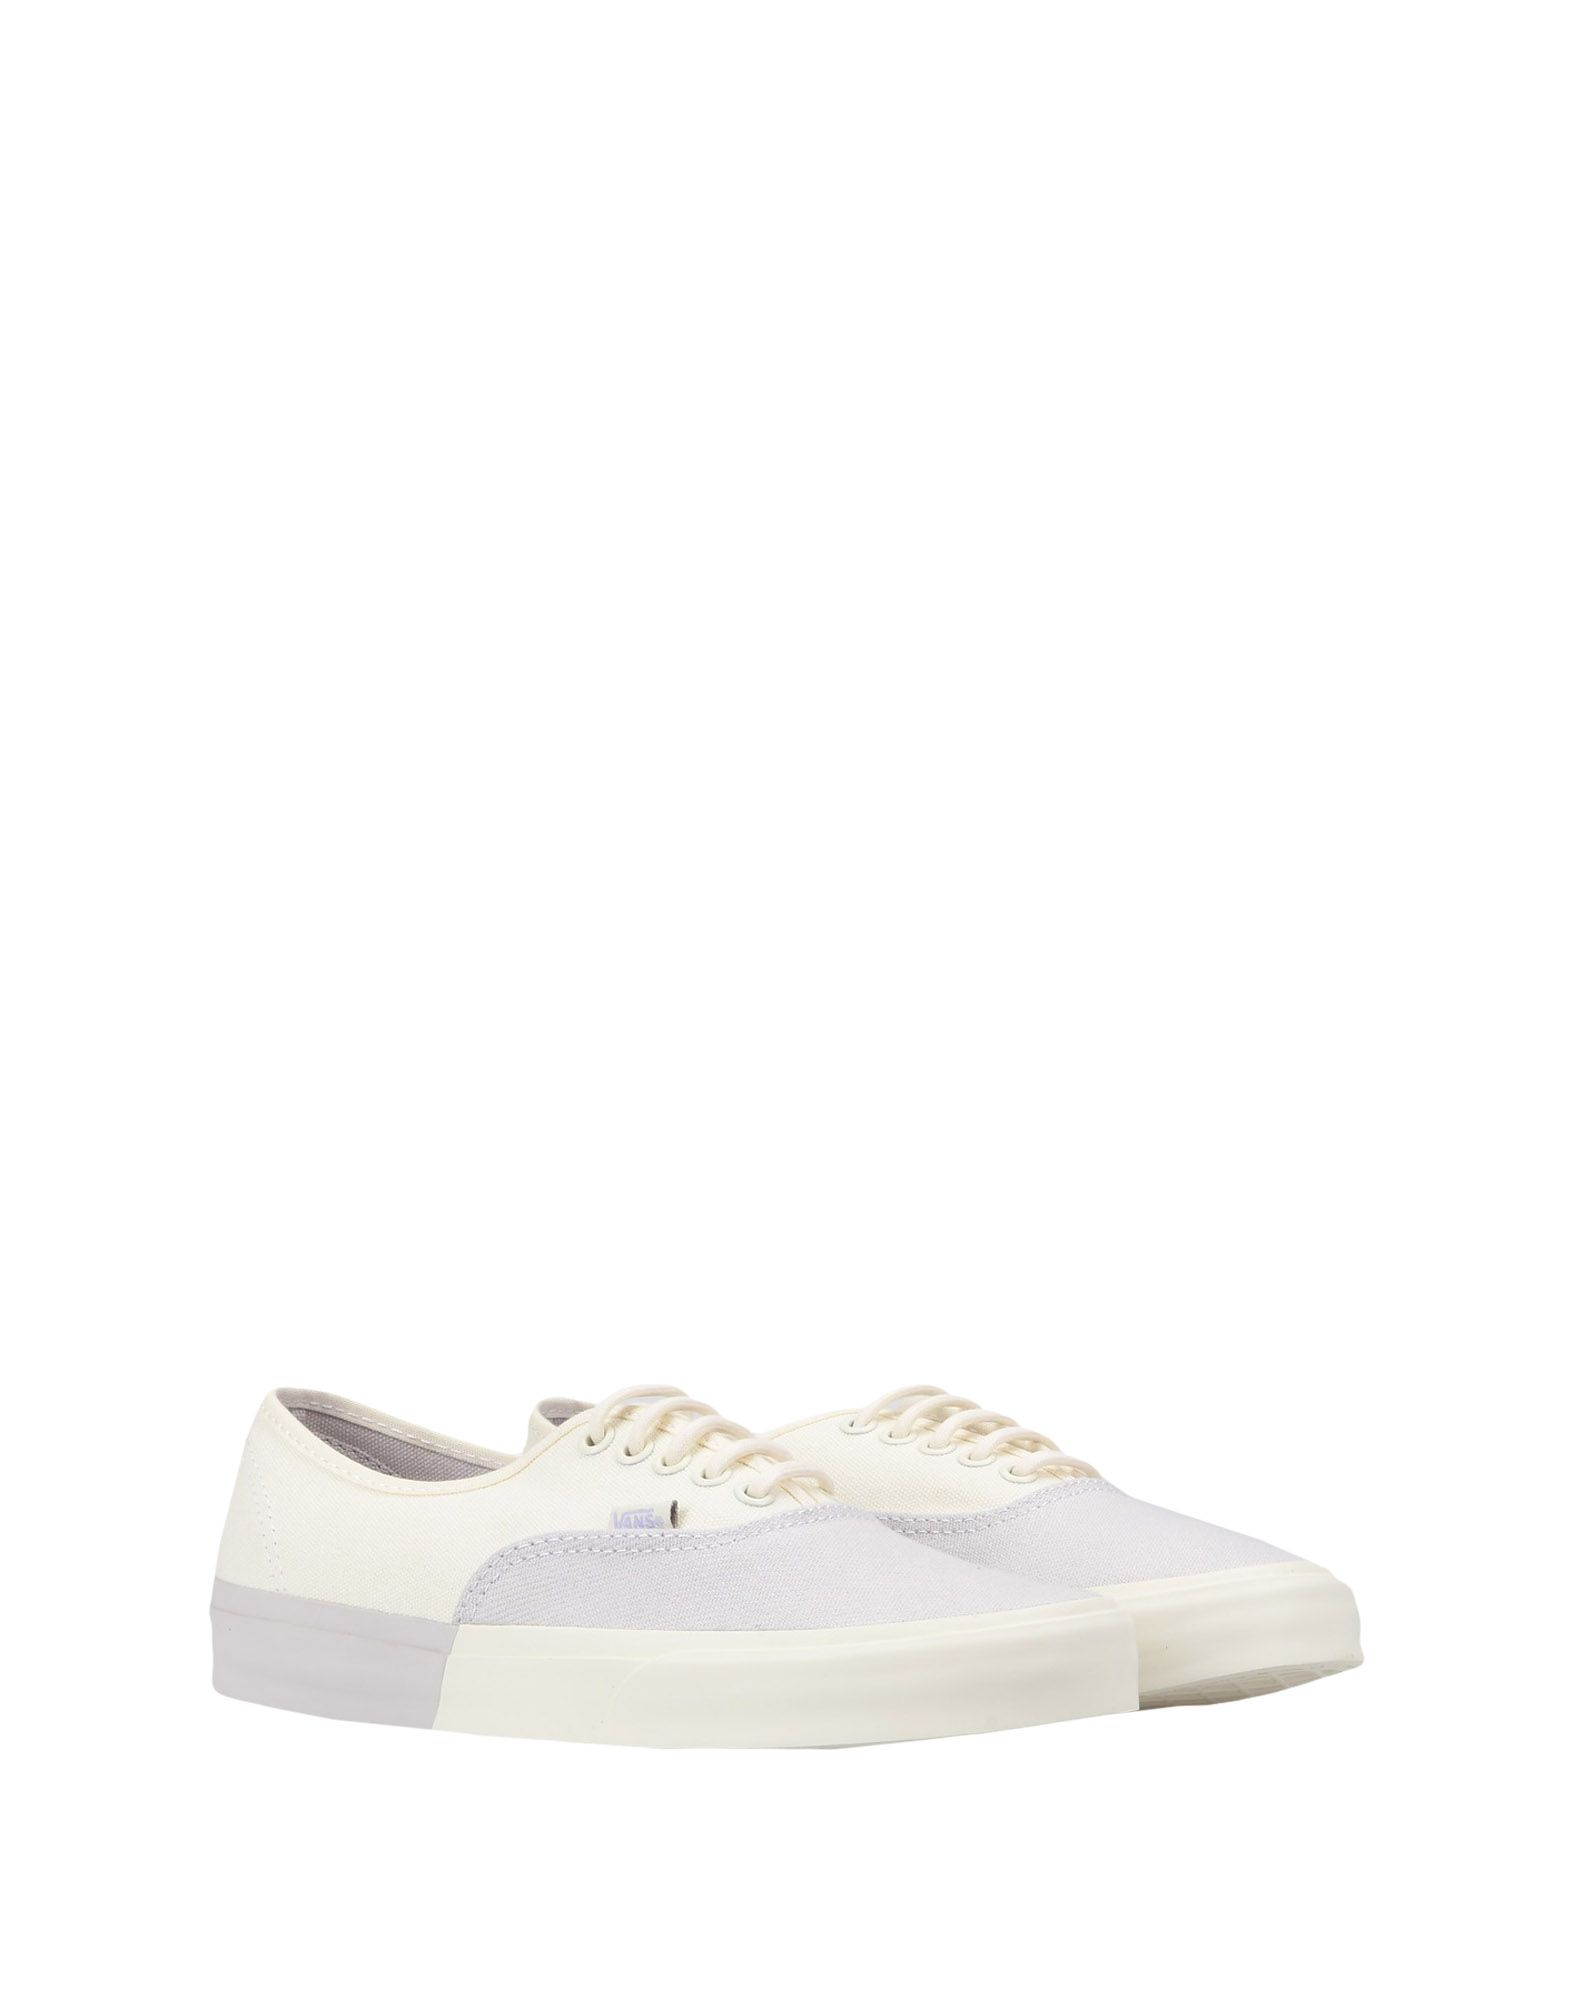 Sneakers Vans Ua Authentic Dx - Blocked - Donna - 11224361PR